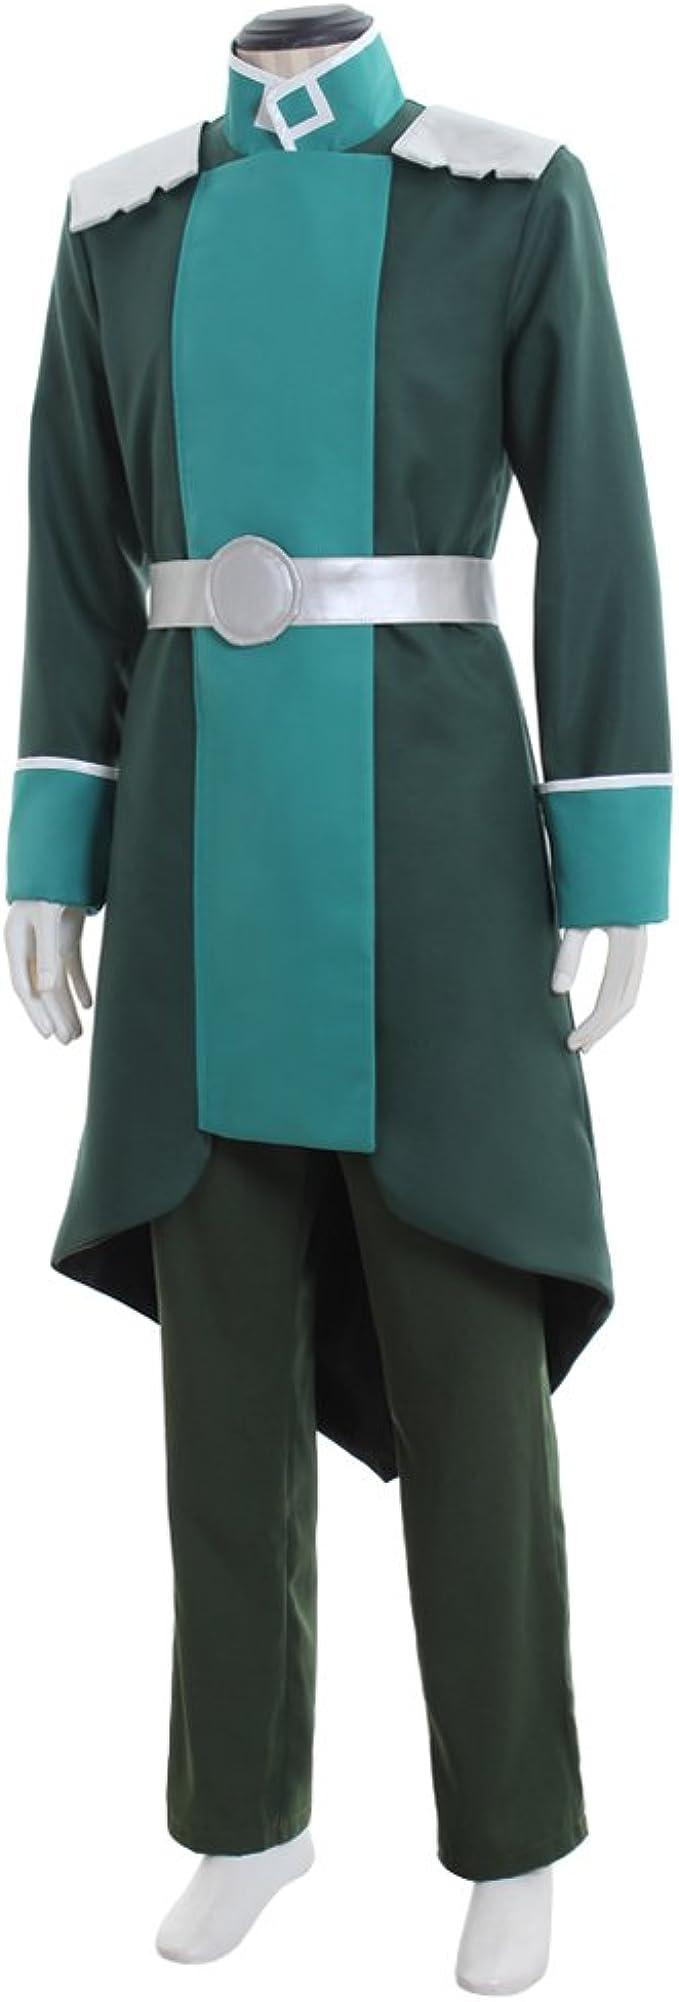 CosplayDiy Men's Suit for Avatar Bolin Cosplay Costume: Clothing - Amazon.com